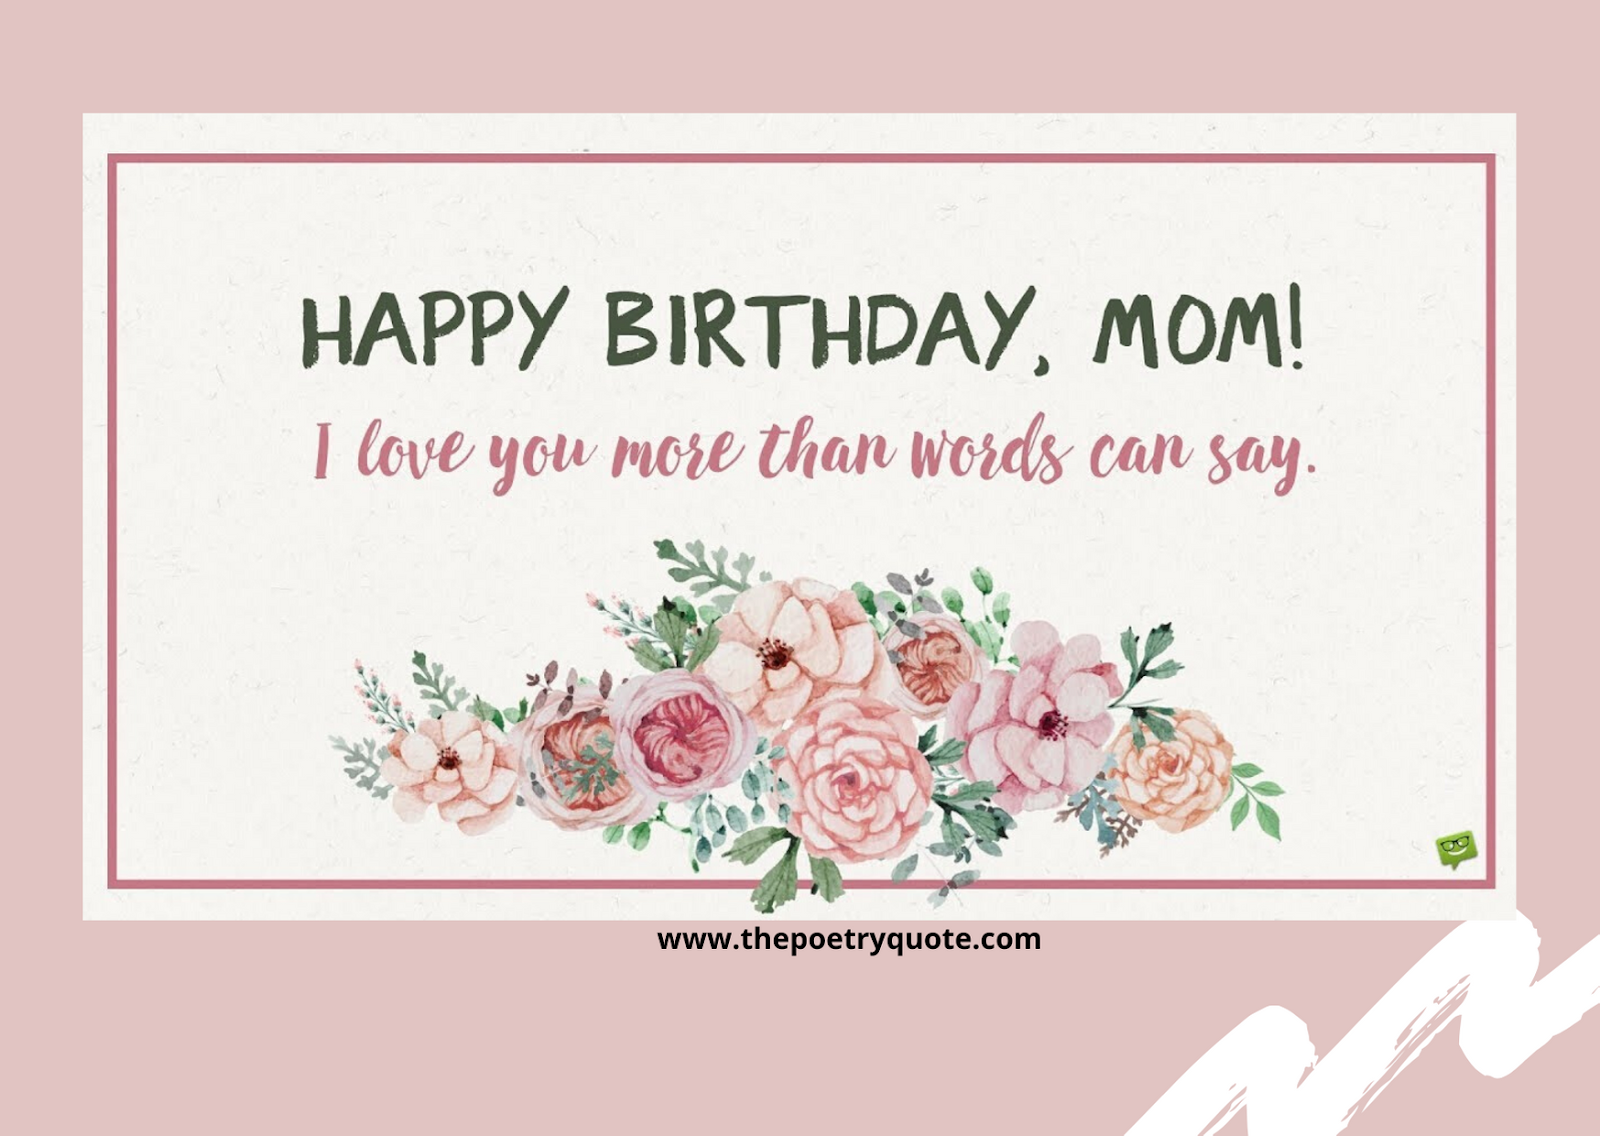 Happy Birthday Mom Happy Birthday Mother Birthday Quotes Happy Birthday Mom Quotes Happy Birthday Mom Wishes Birthday Wishes For Mom